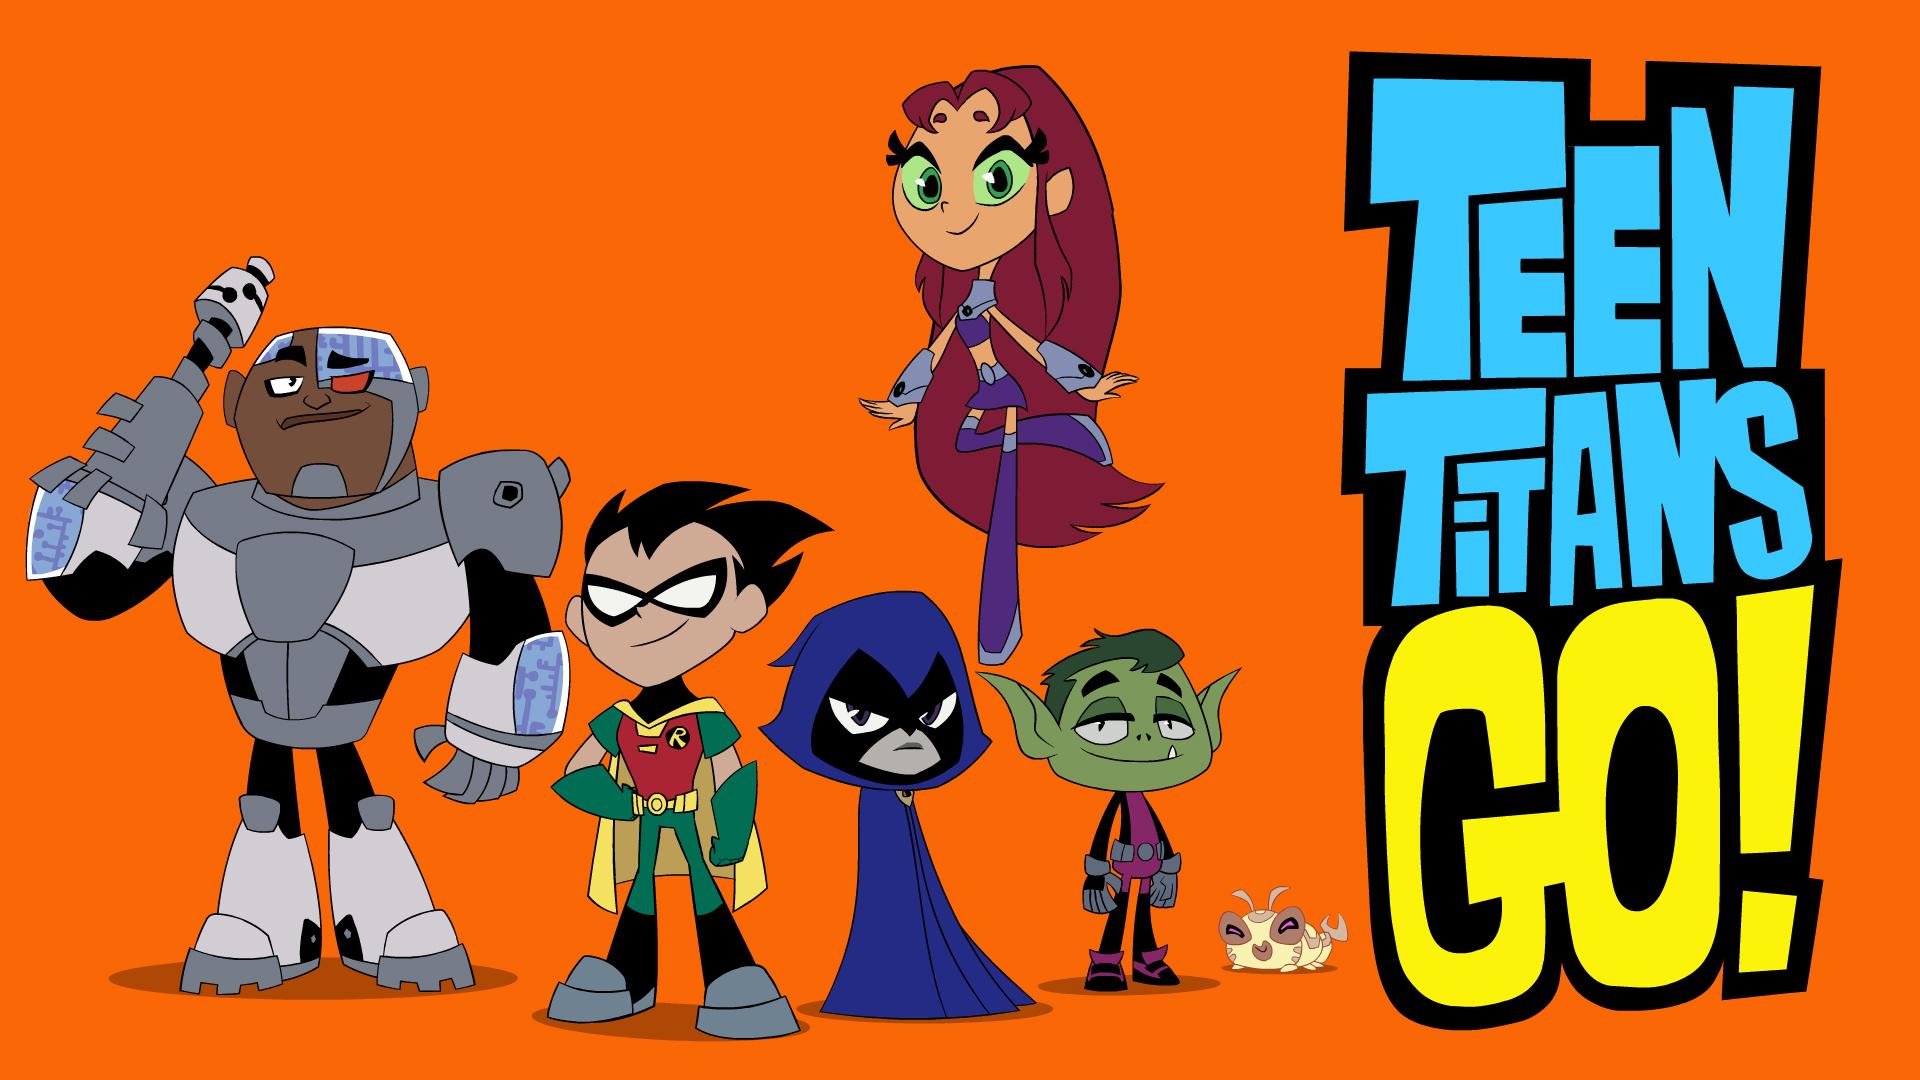 Les Jeunes Titans, Les Super Héros, Dessin Animé, Robin Starfire, Adolescent Titans.